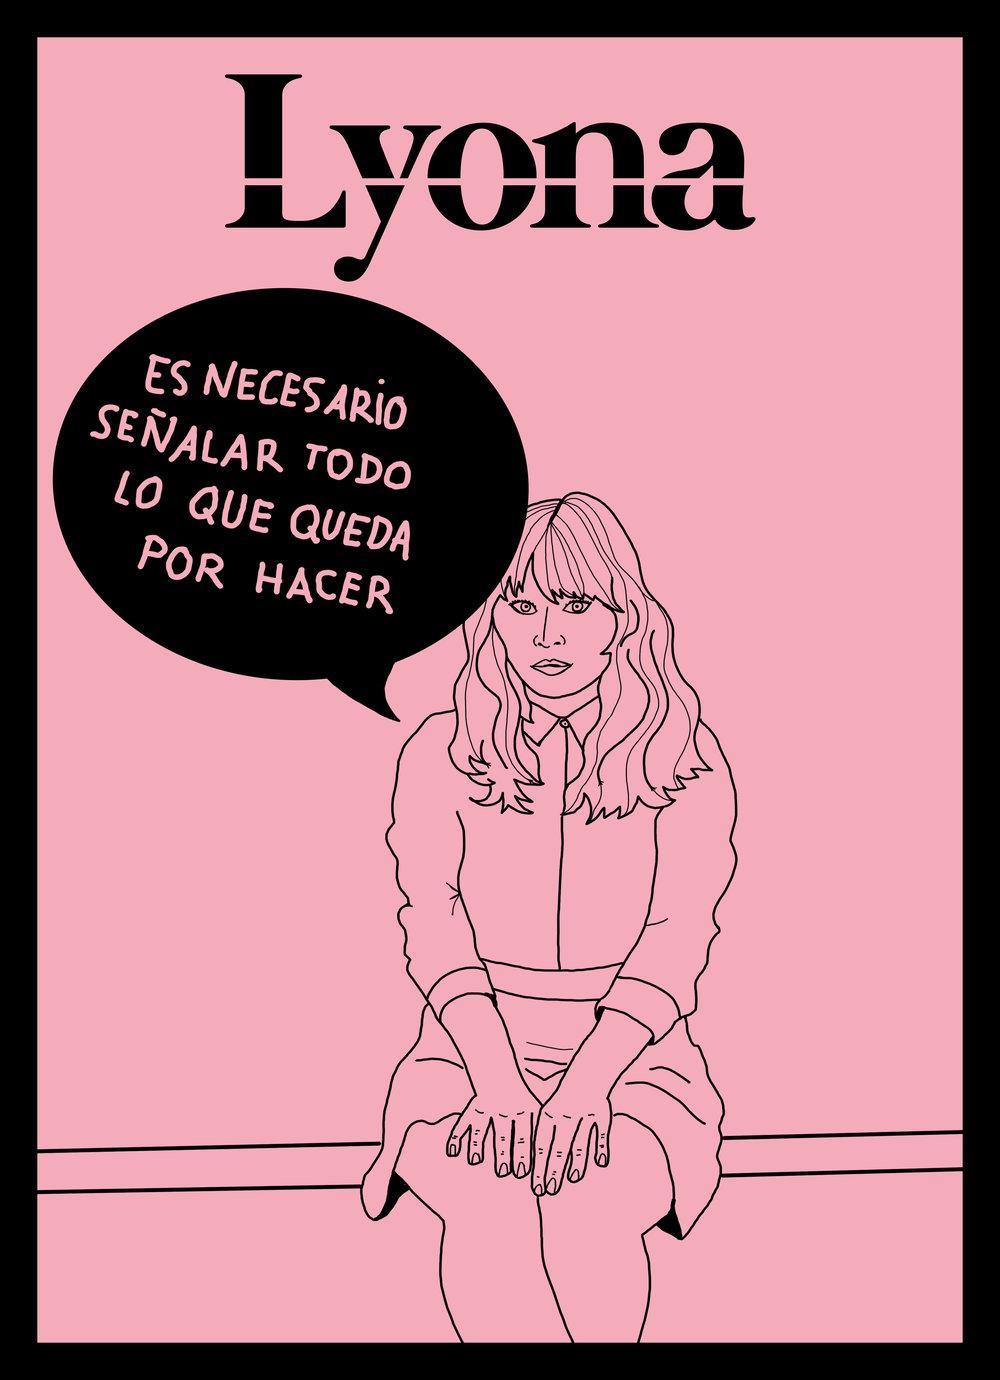 Lyona.jpg